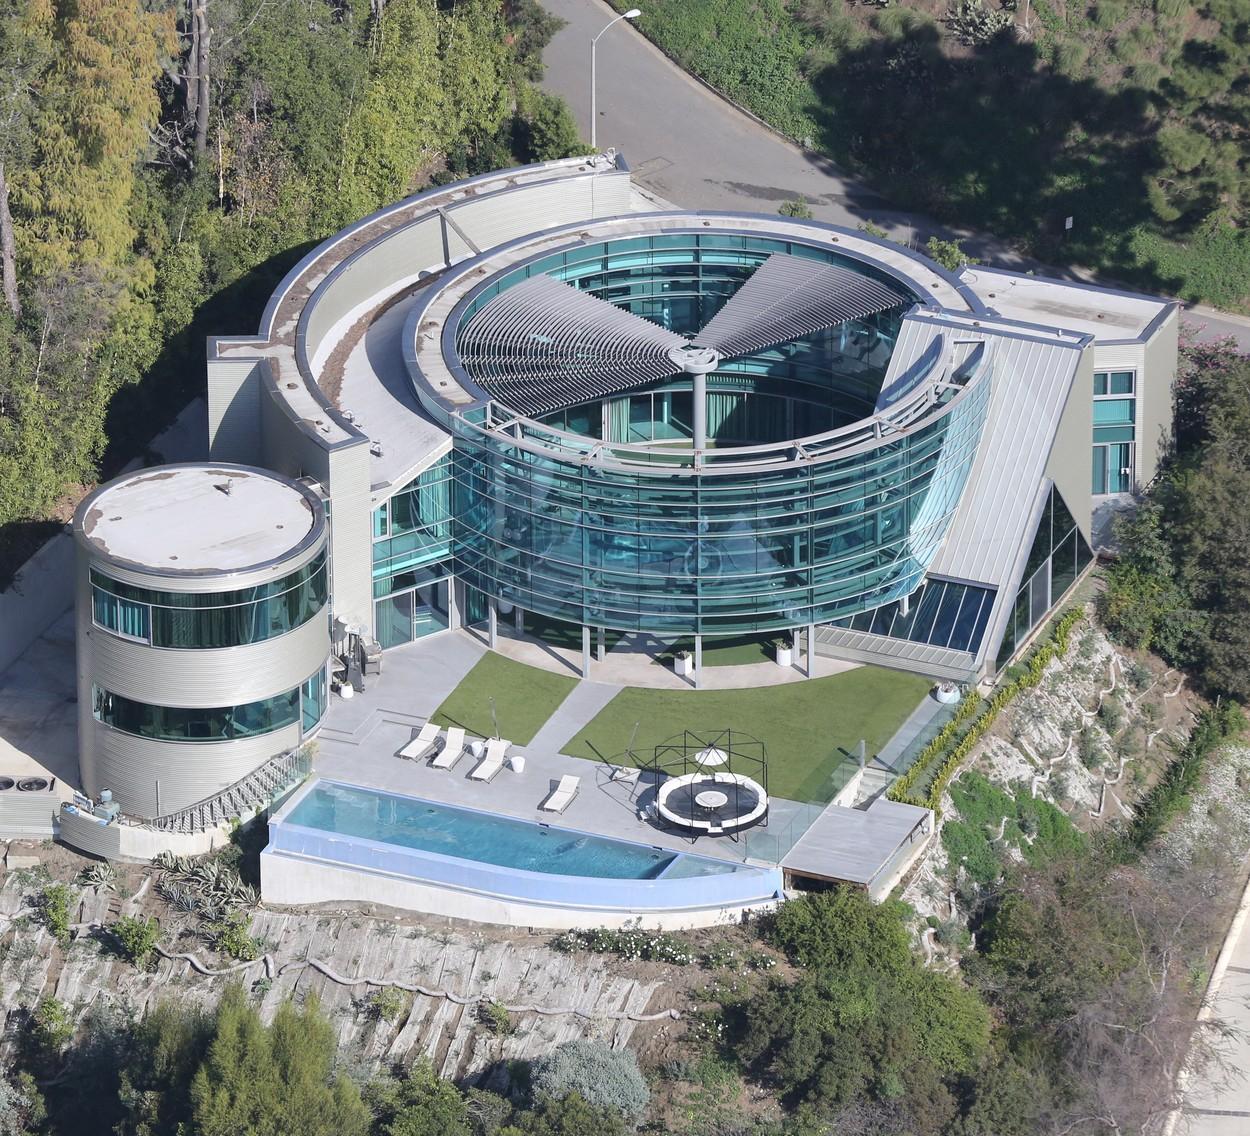 Dům v Beverly Hills s nájmem 55 000 korun. Denně